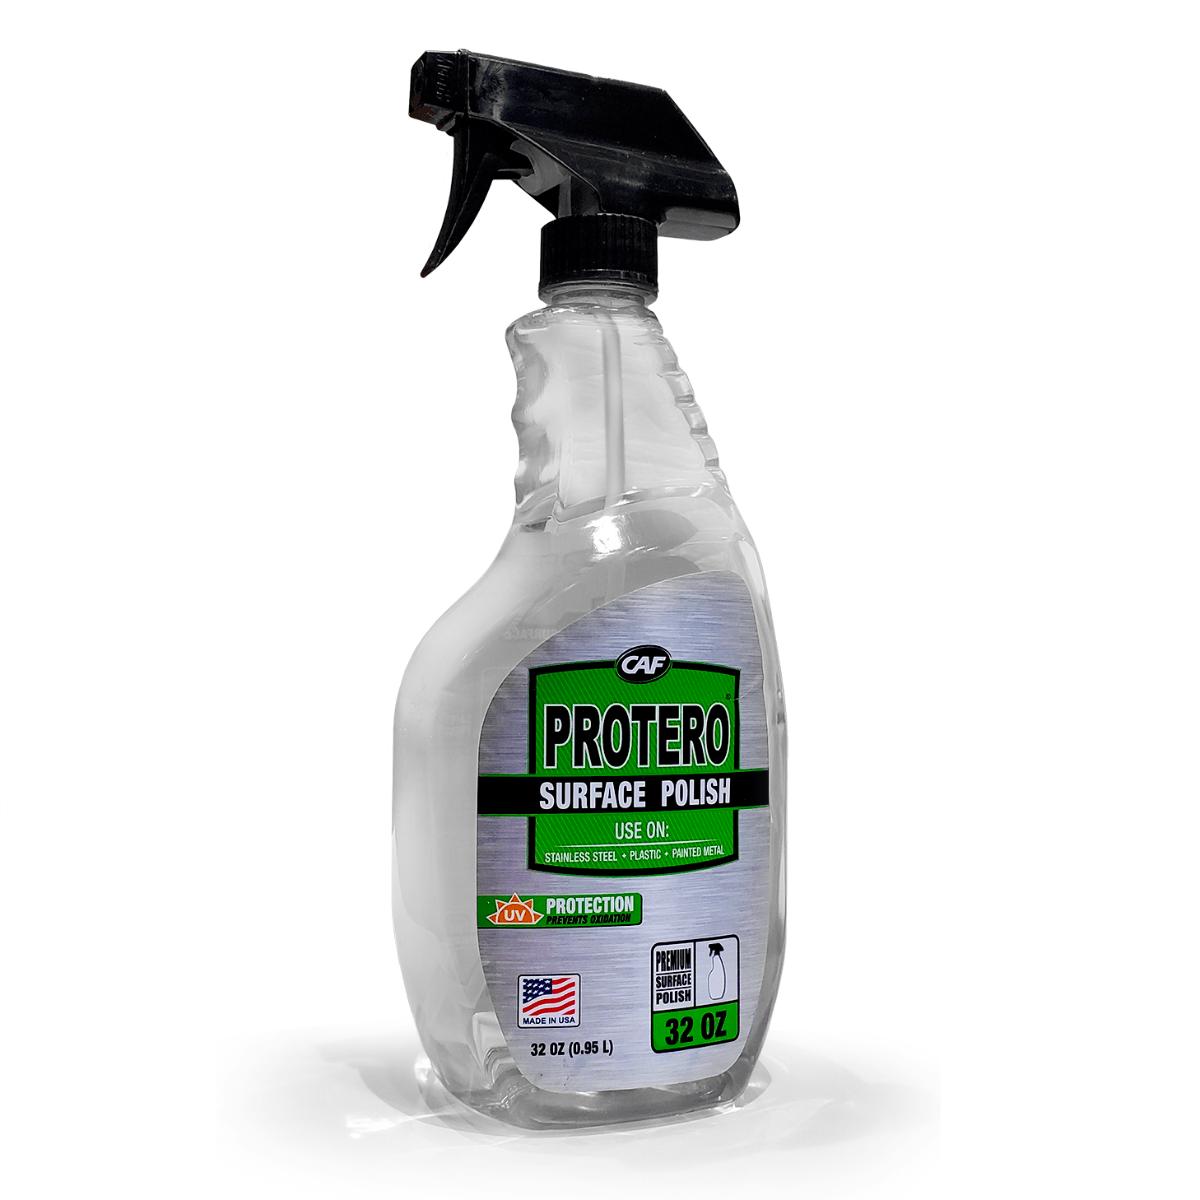 protero premium surface polish